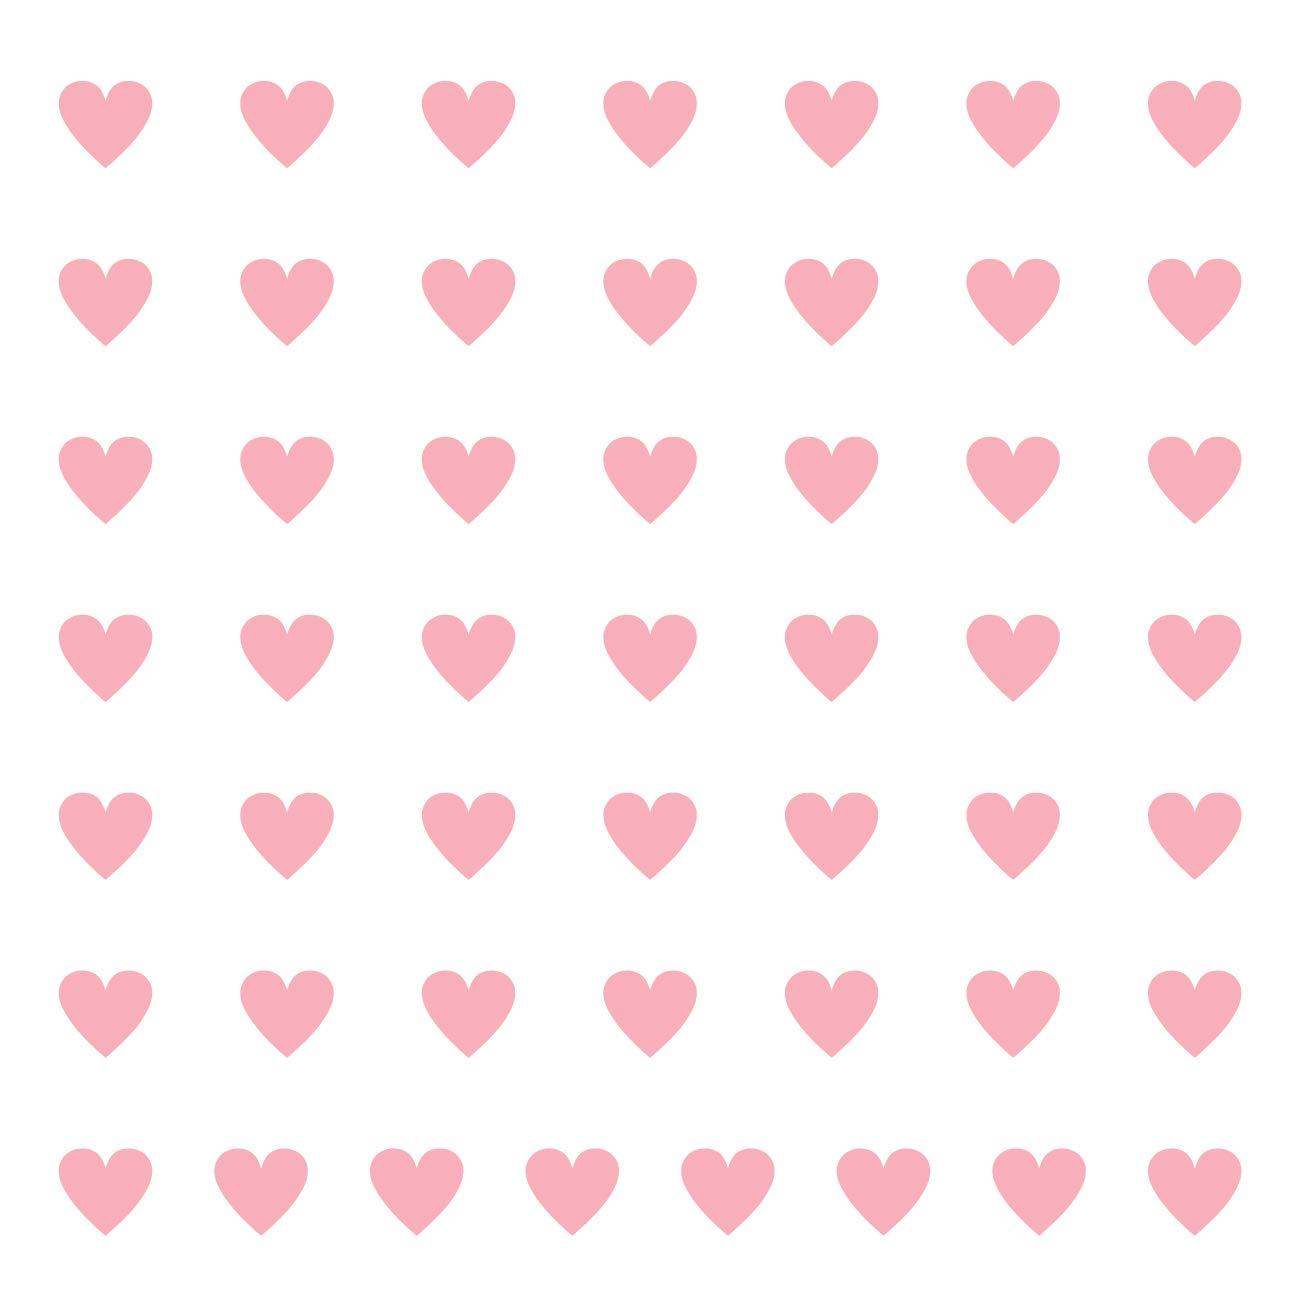 confetti hearts heart wall art girl room decorations heart wall decor nursery decor nursery wall art  #010 Heart wall decal